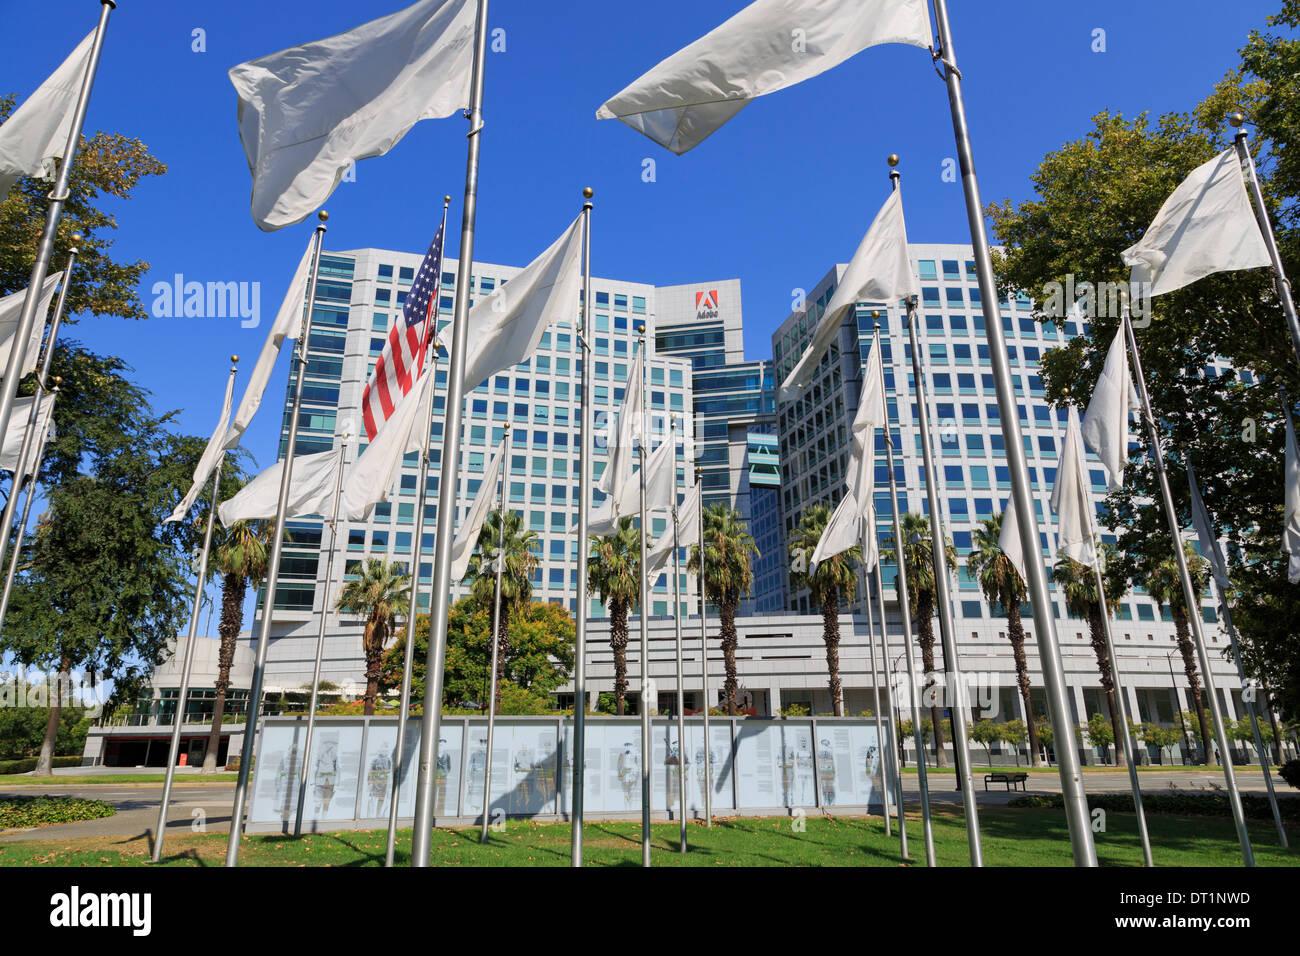 Flags in the Veteran's Memorial and Adobe Corporation, San Jose, California, United States of America, North America - Stock Image